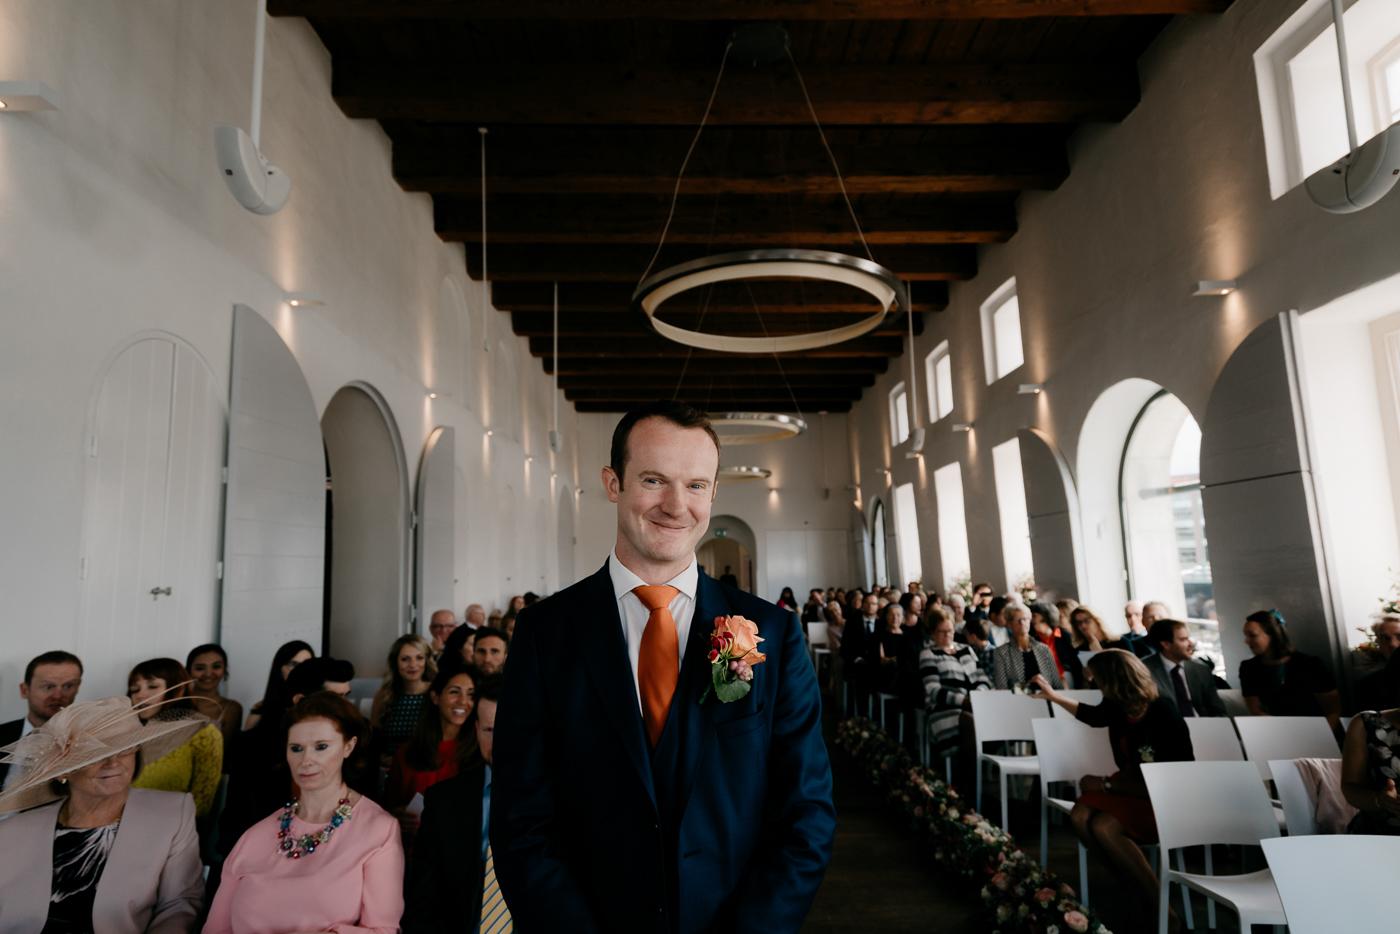 bruidsfotografie-trouwfotograaf-wedding-photographer-amsterdam-James-Jantine-106.jpg